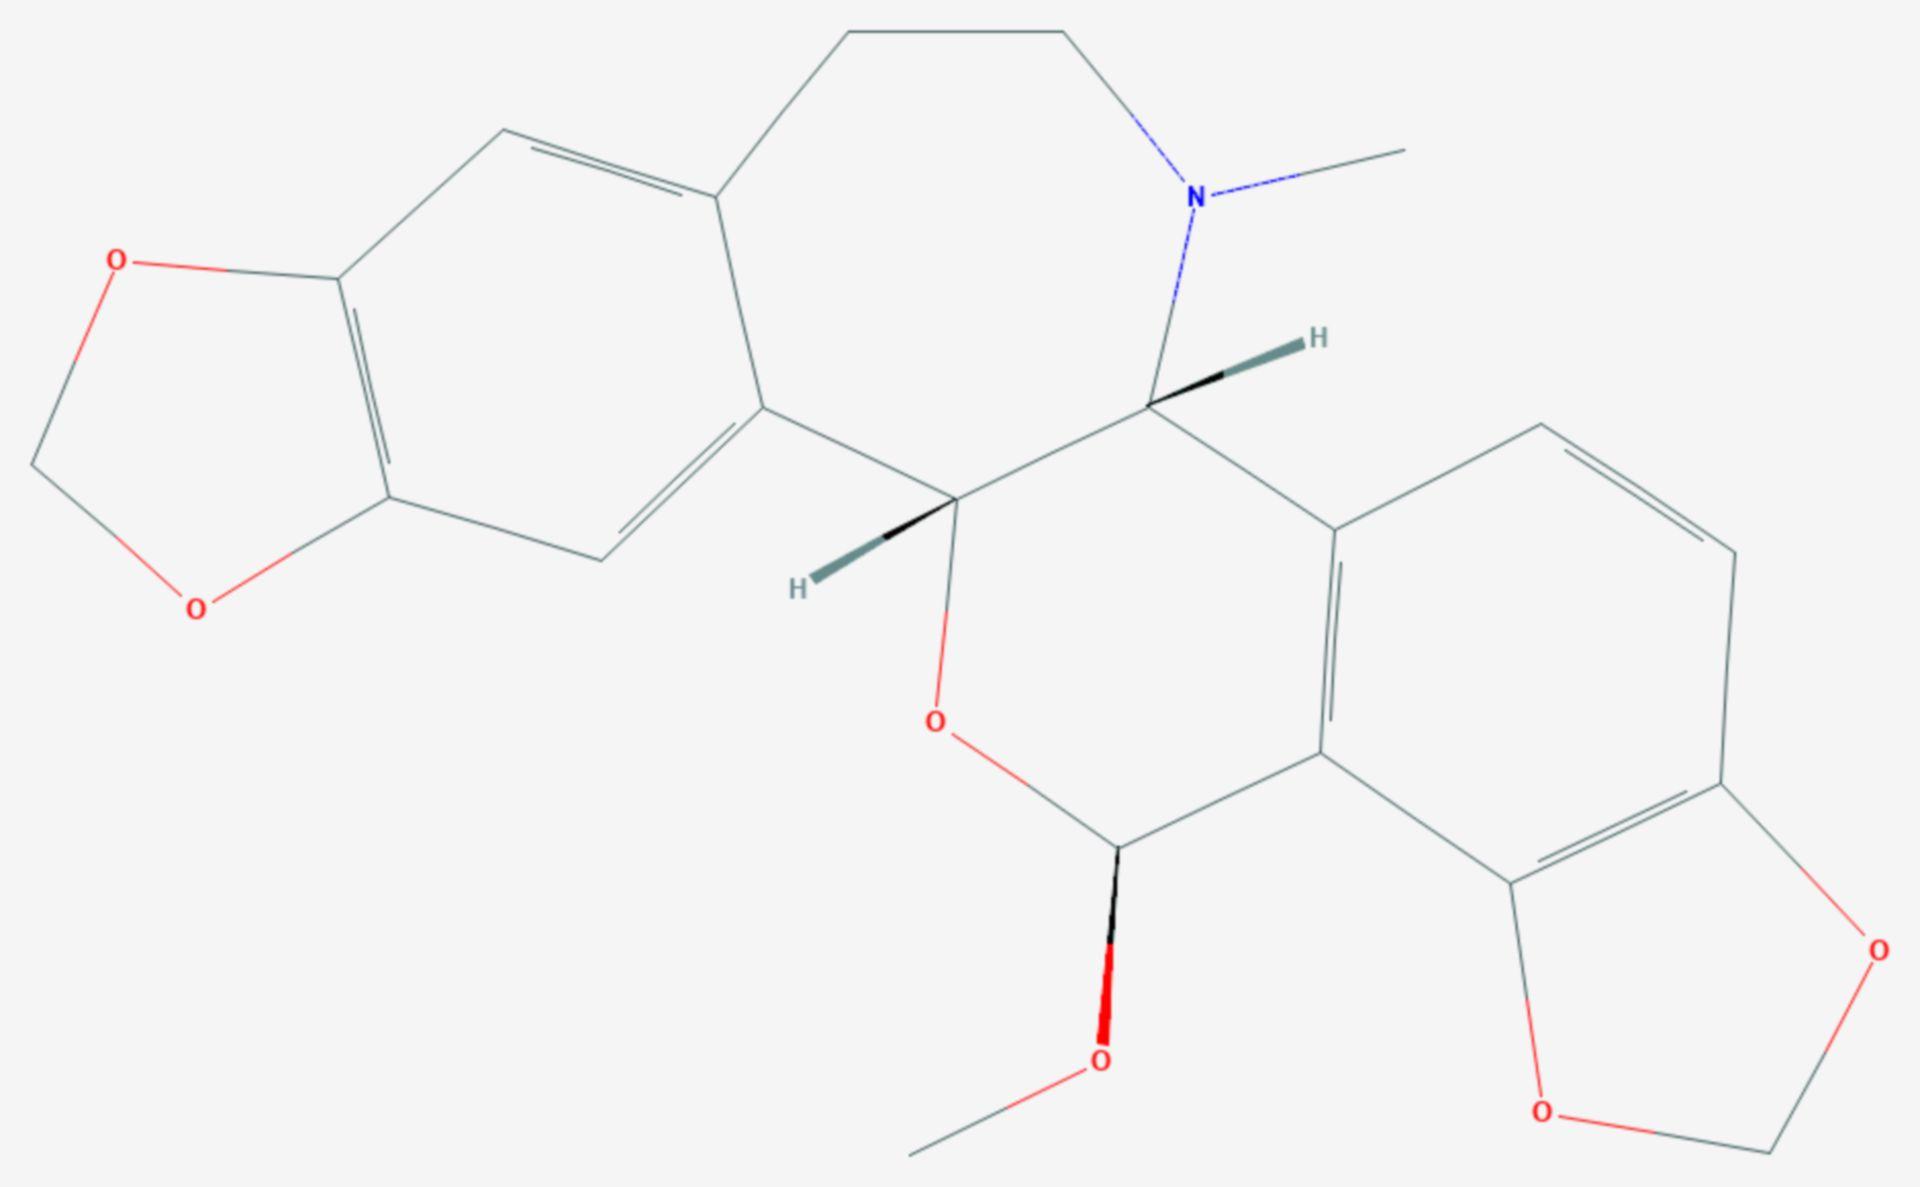 Rhoeadin (Strukturformel)